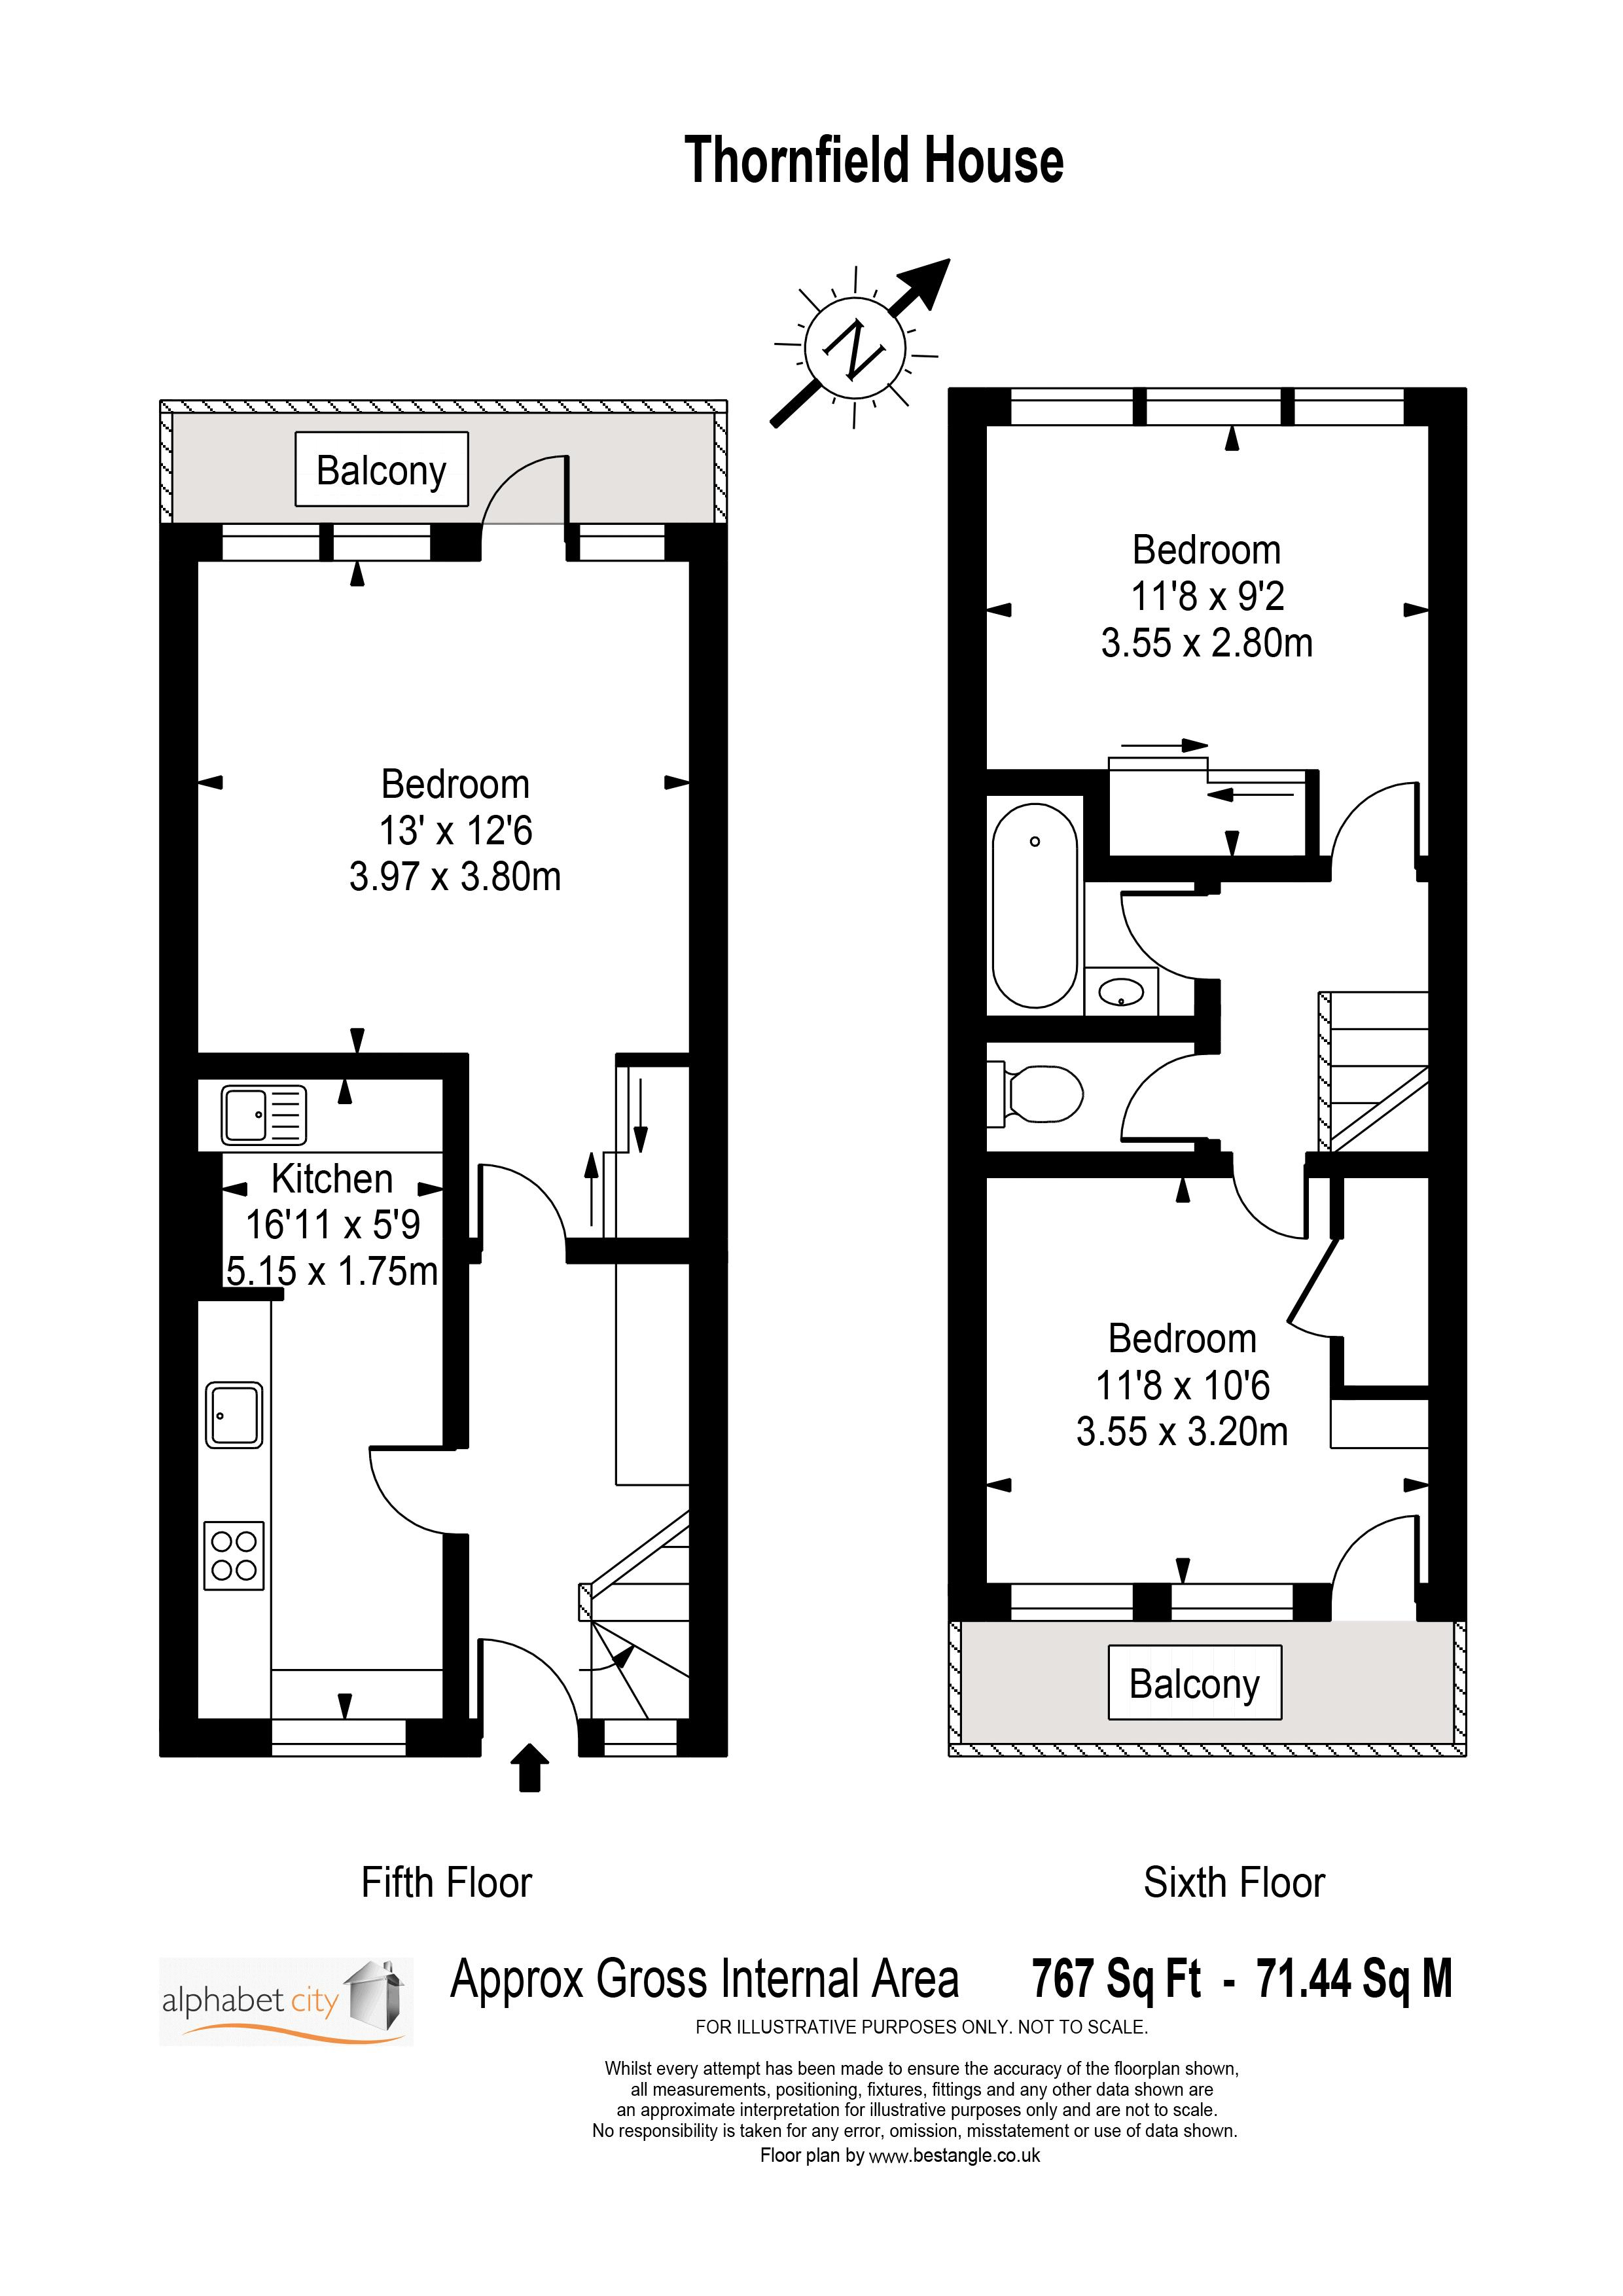 Thornfield House Floorplan